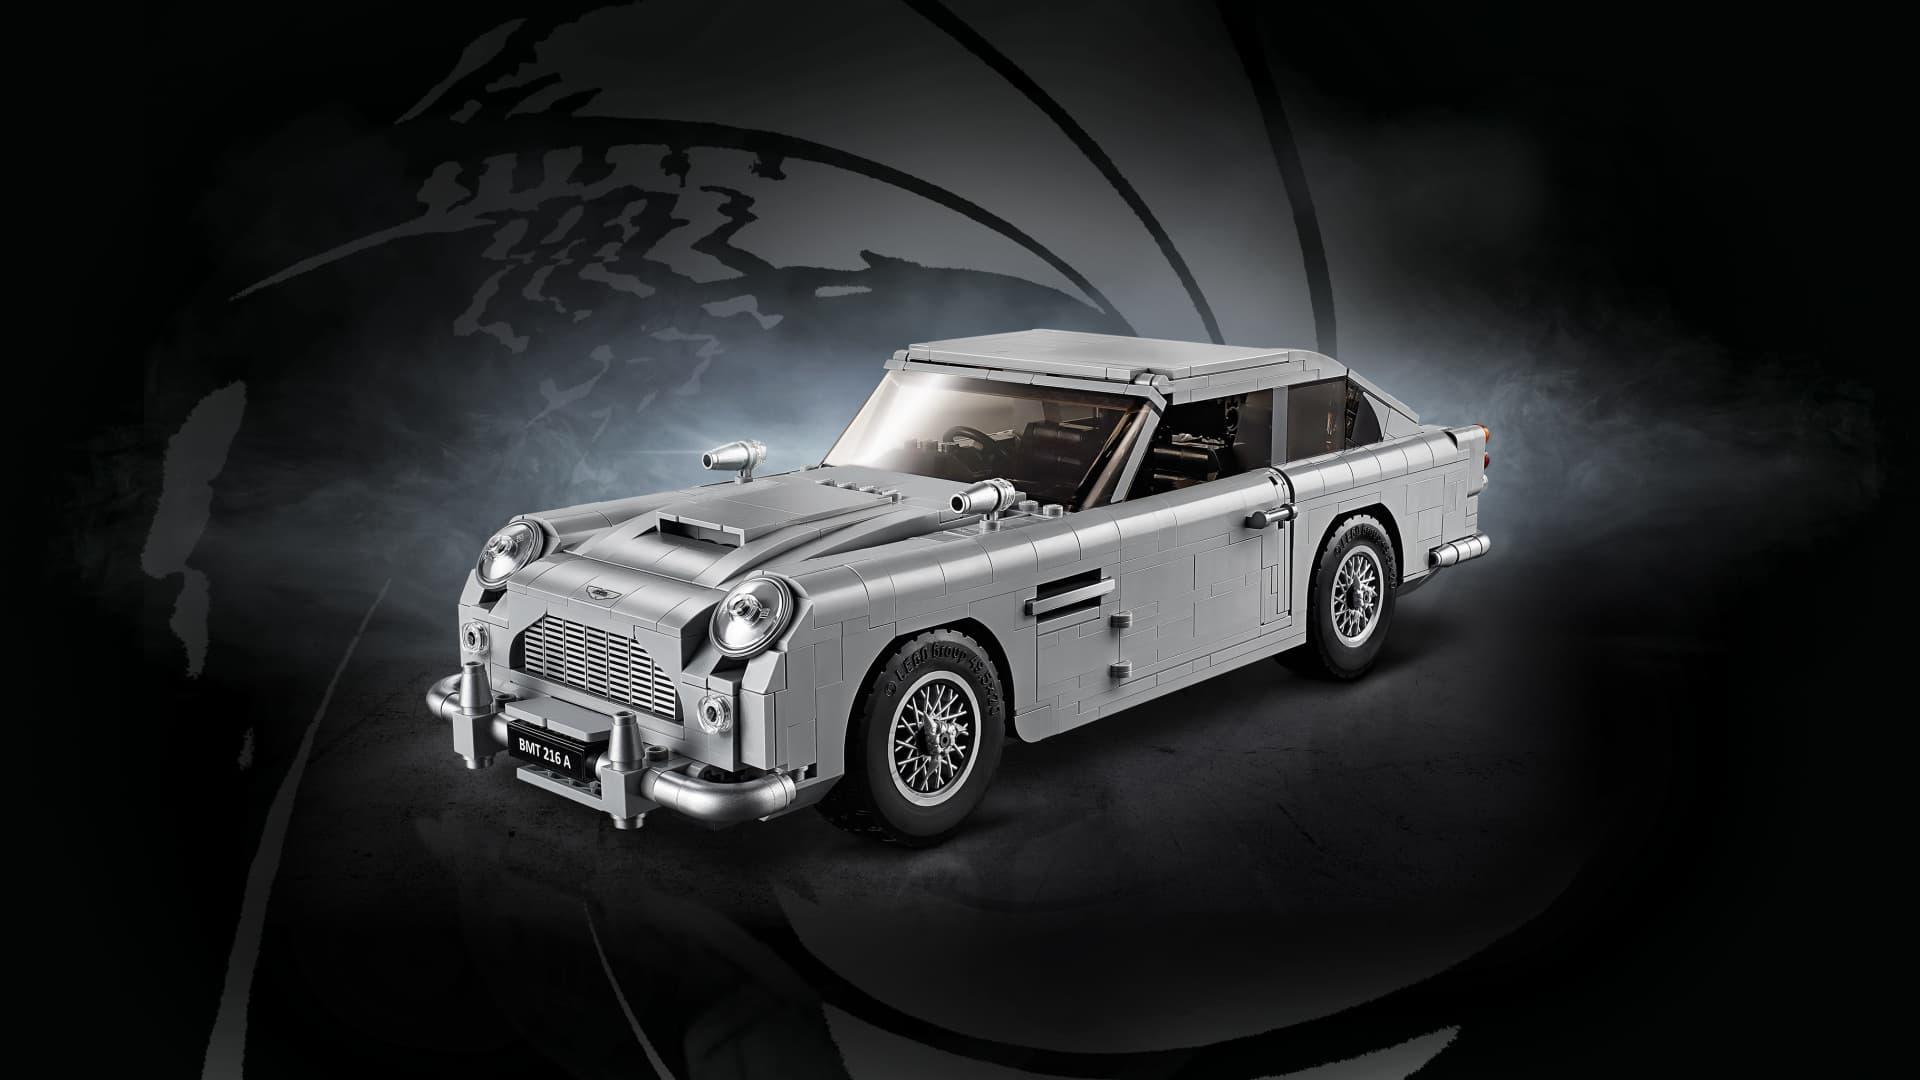 Lego Aston Martin Db5 Dm 5